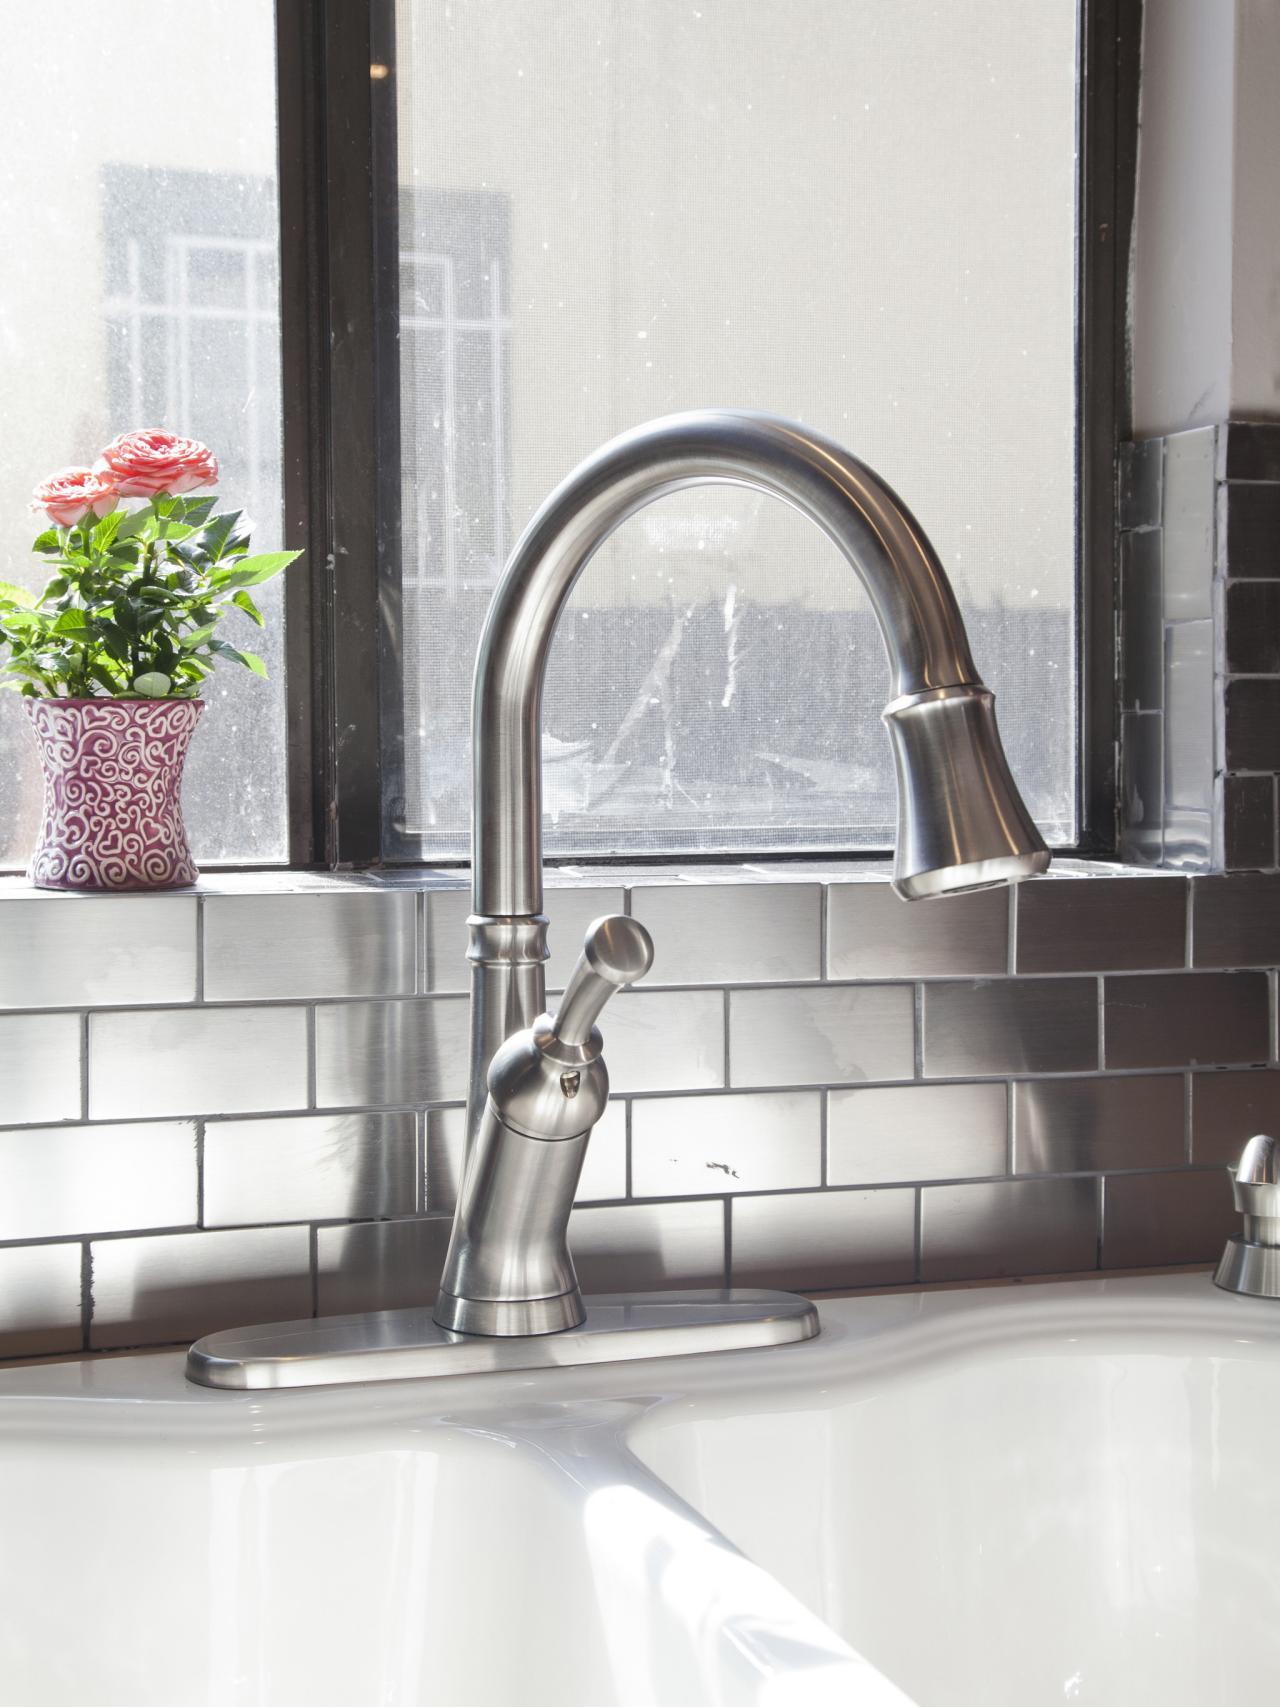 HBRVB104_team-jonathan-kitchen-faucet-after_v.jpg.rend.hgtvcom.1280.1707